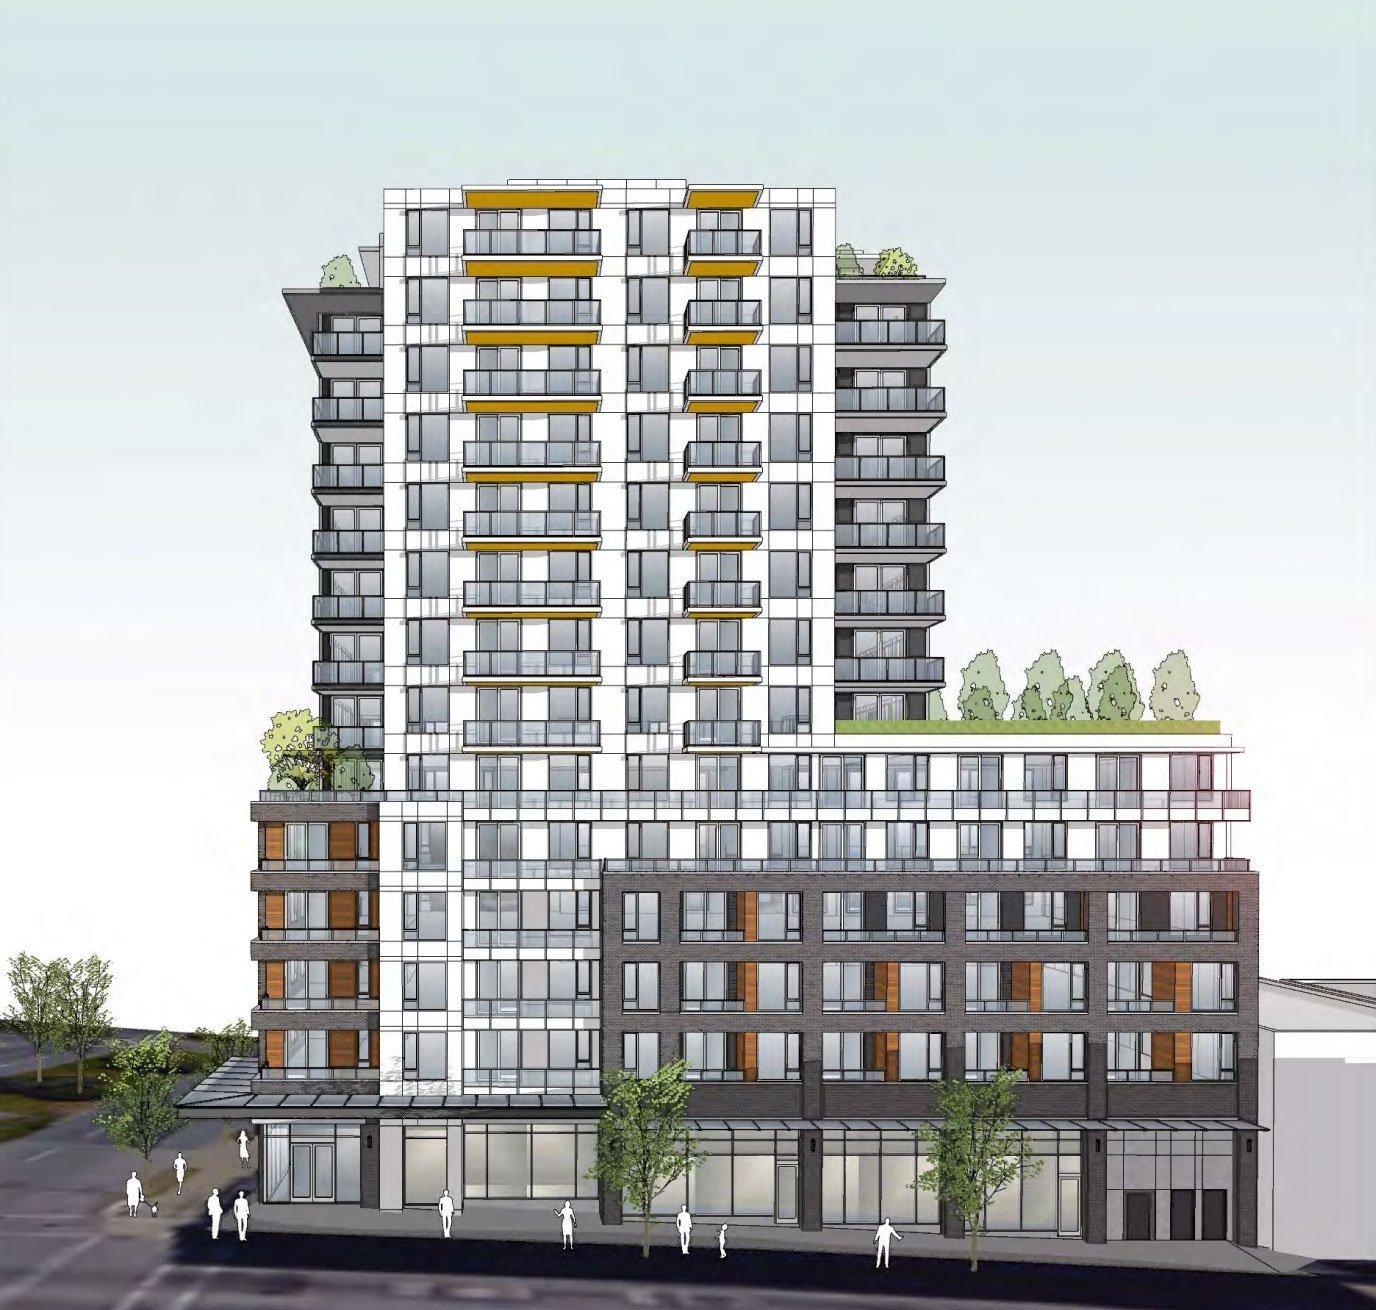 Housing Rental: Moderate Income Rental Housing Pilot Program Towers Slated